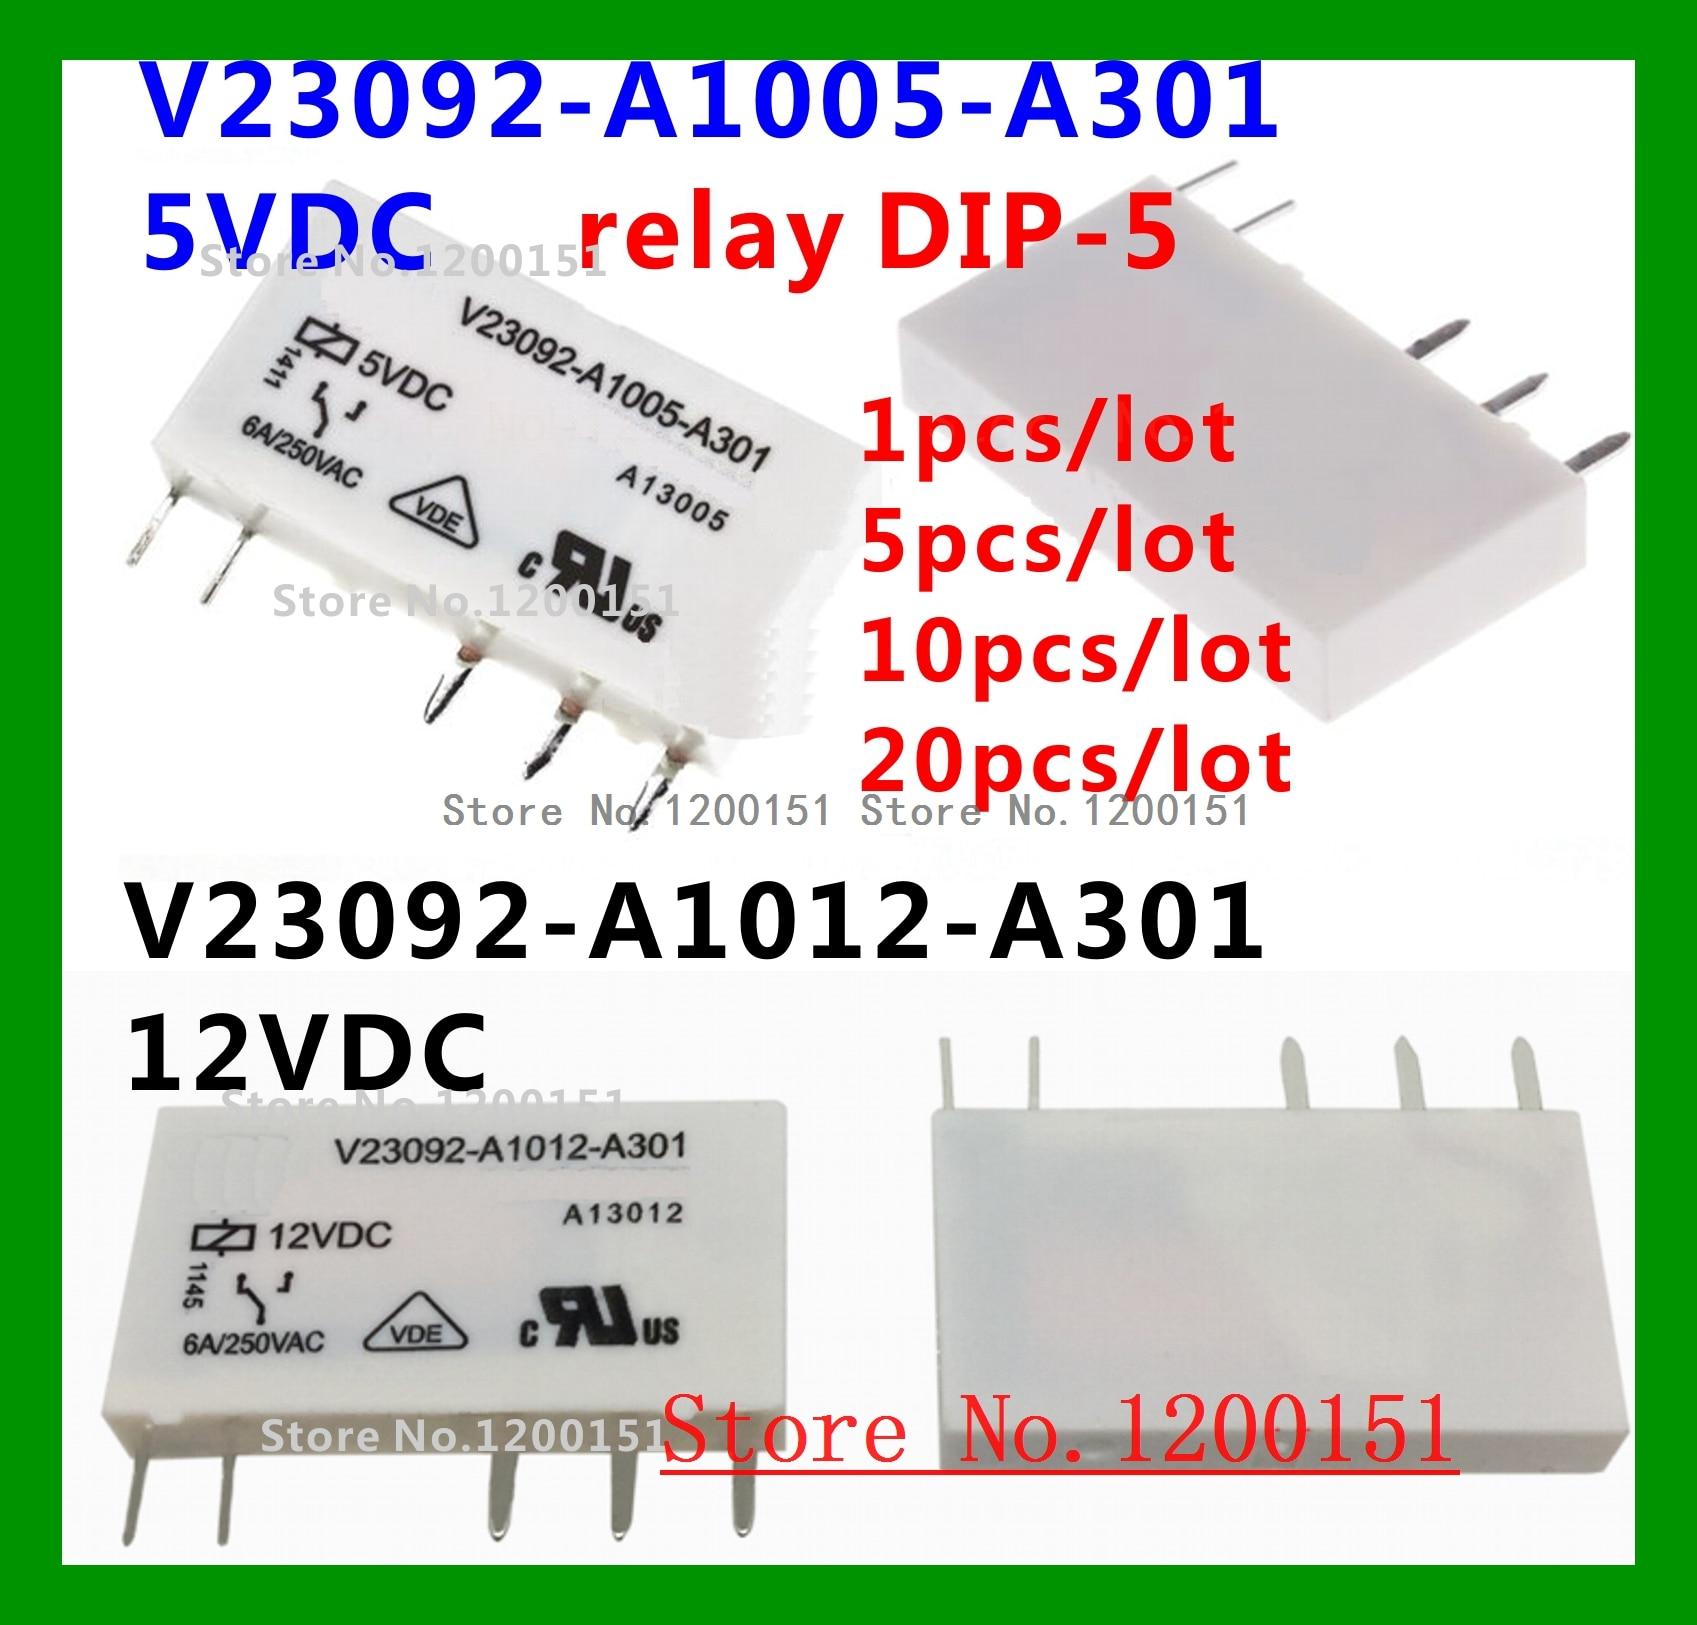 V23092-A1005-A301 5VDC V23092-A1012-A301 12VDC 릴레이 DIP-5